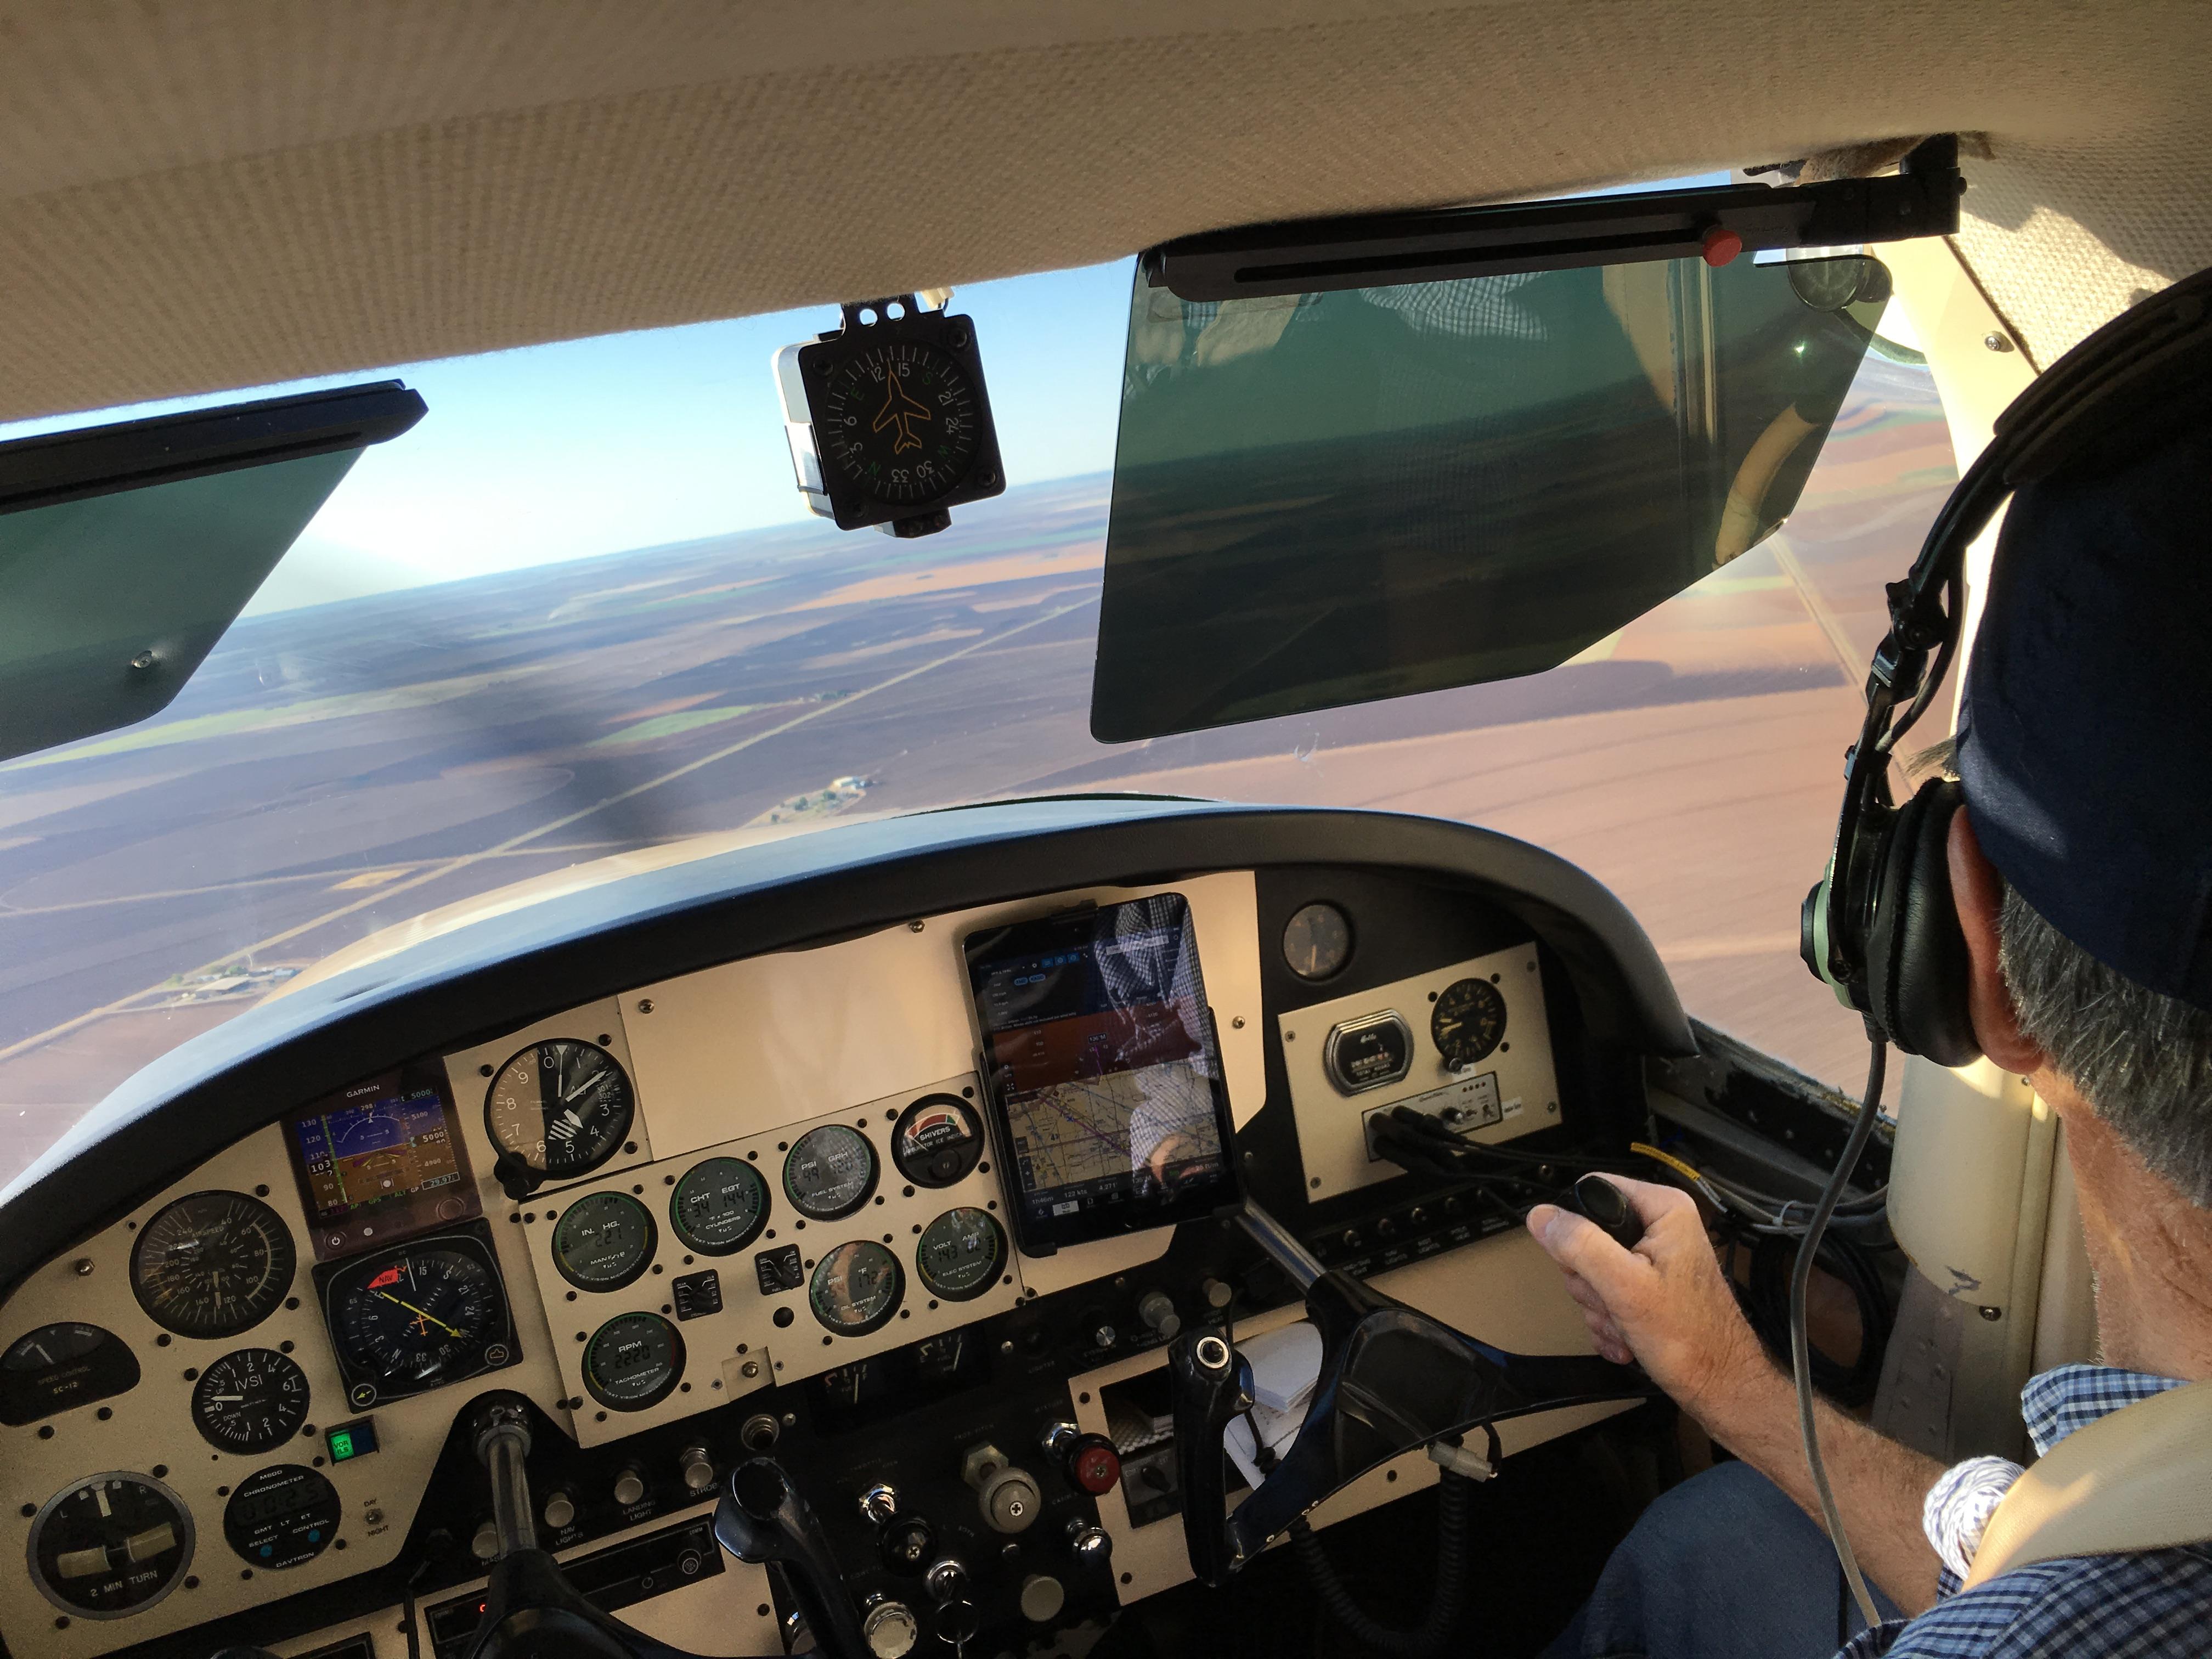 Panel mounted iPad - Cessna 180? - Backcountry Pilot